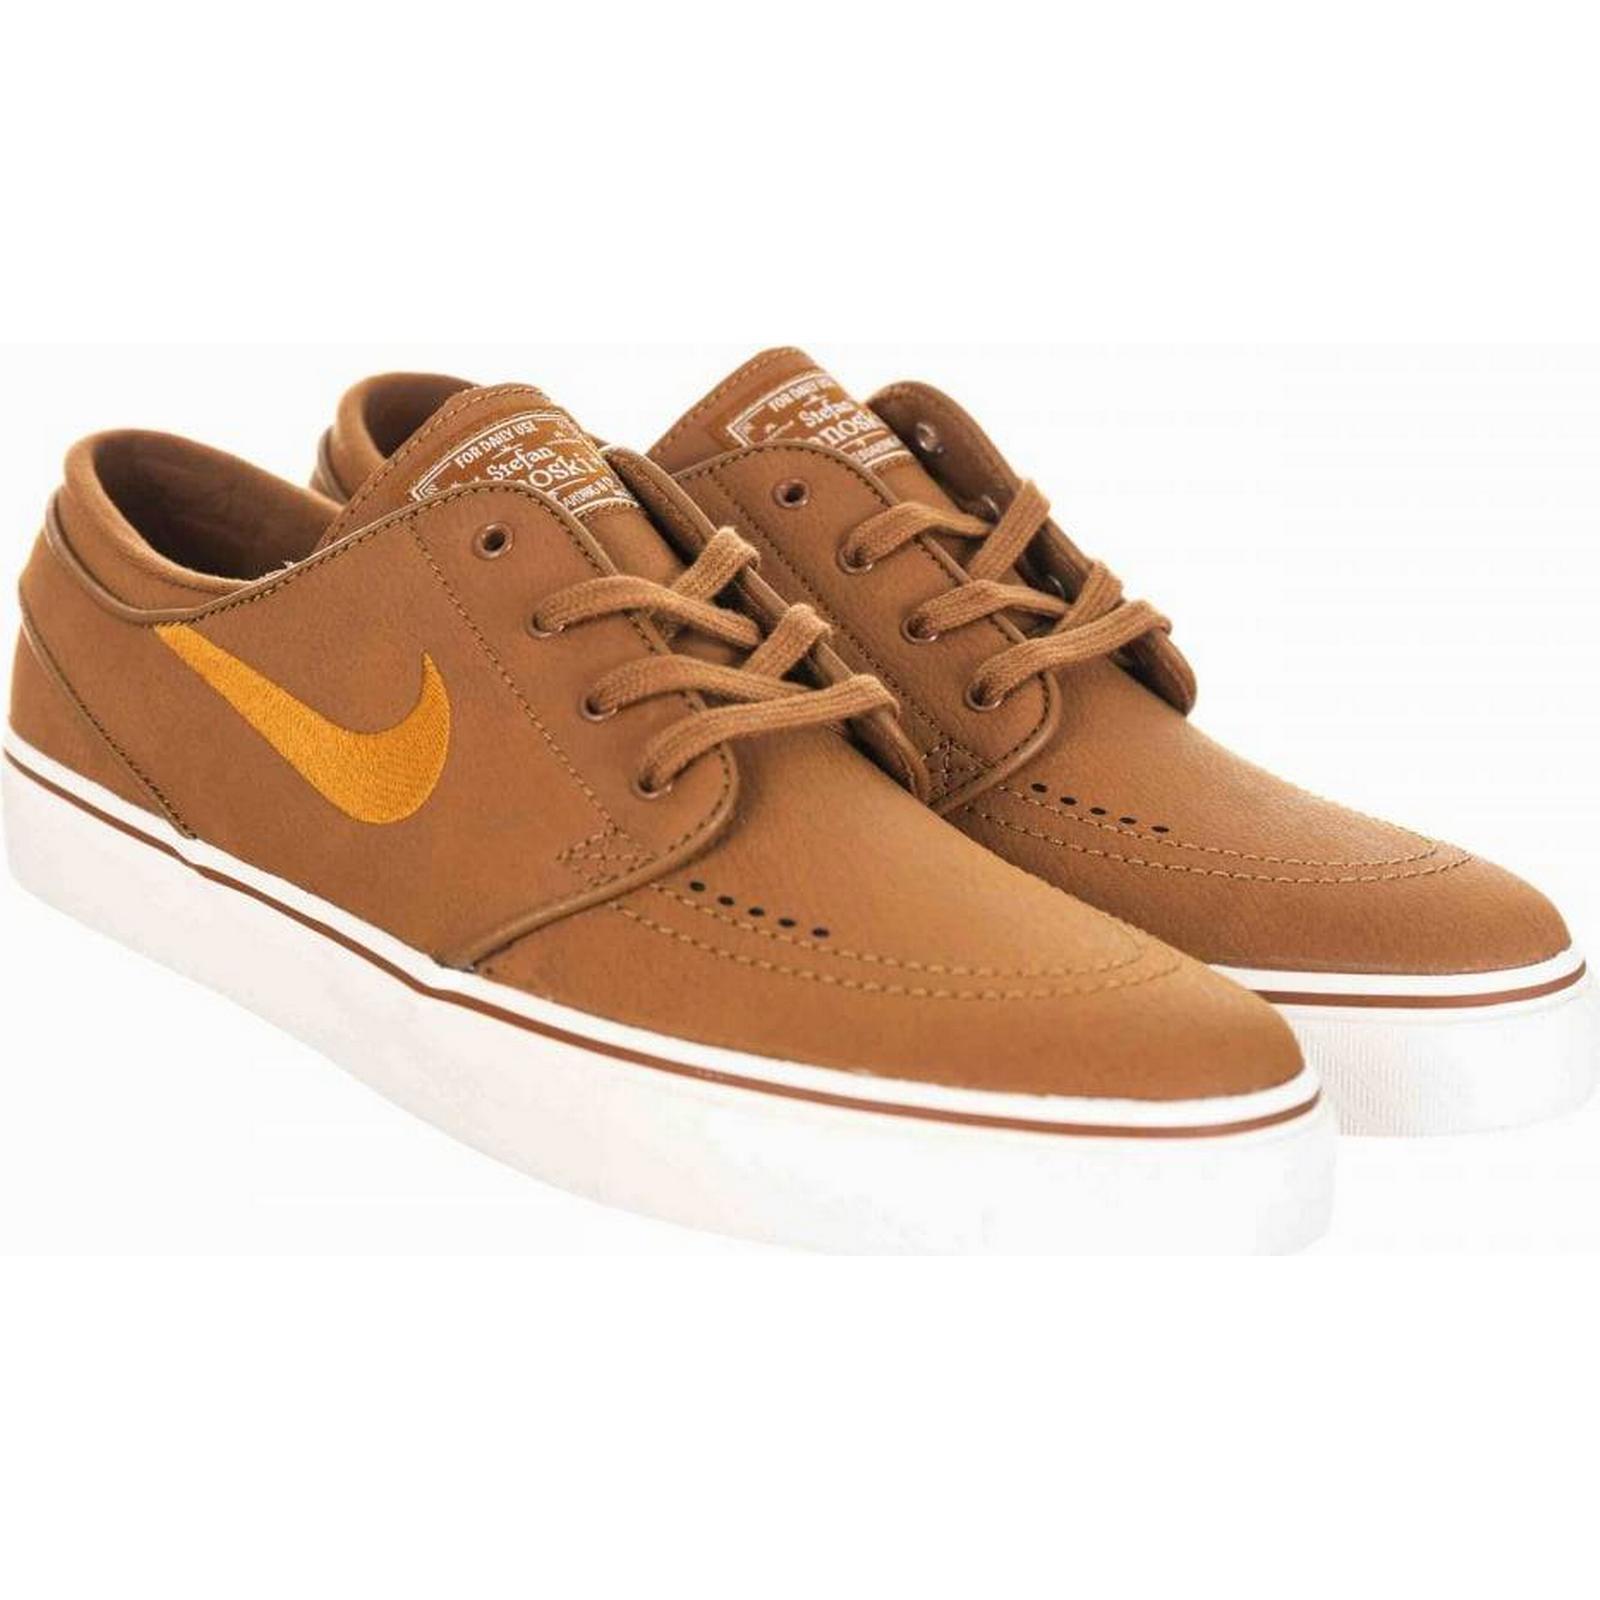 Nike SB Stefan Colour: Janoski Shoes - Ale Brown/Desert Ochre Colour: Stefan Ale Brow 9b975d